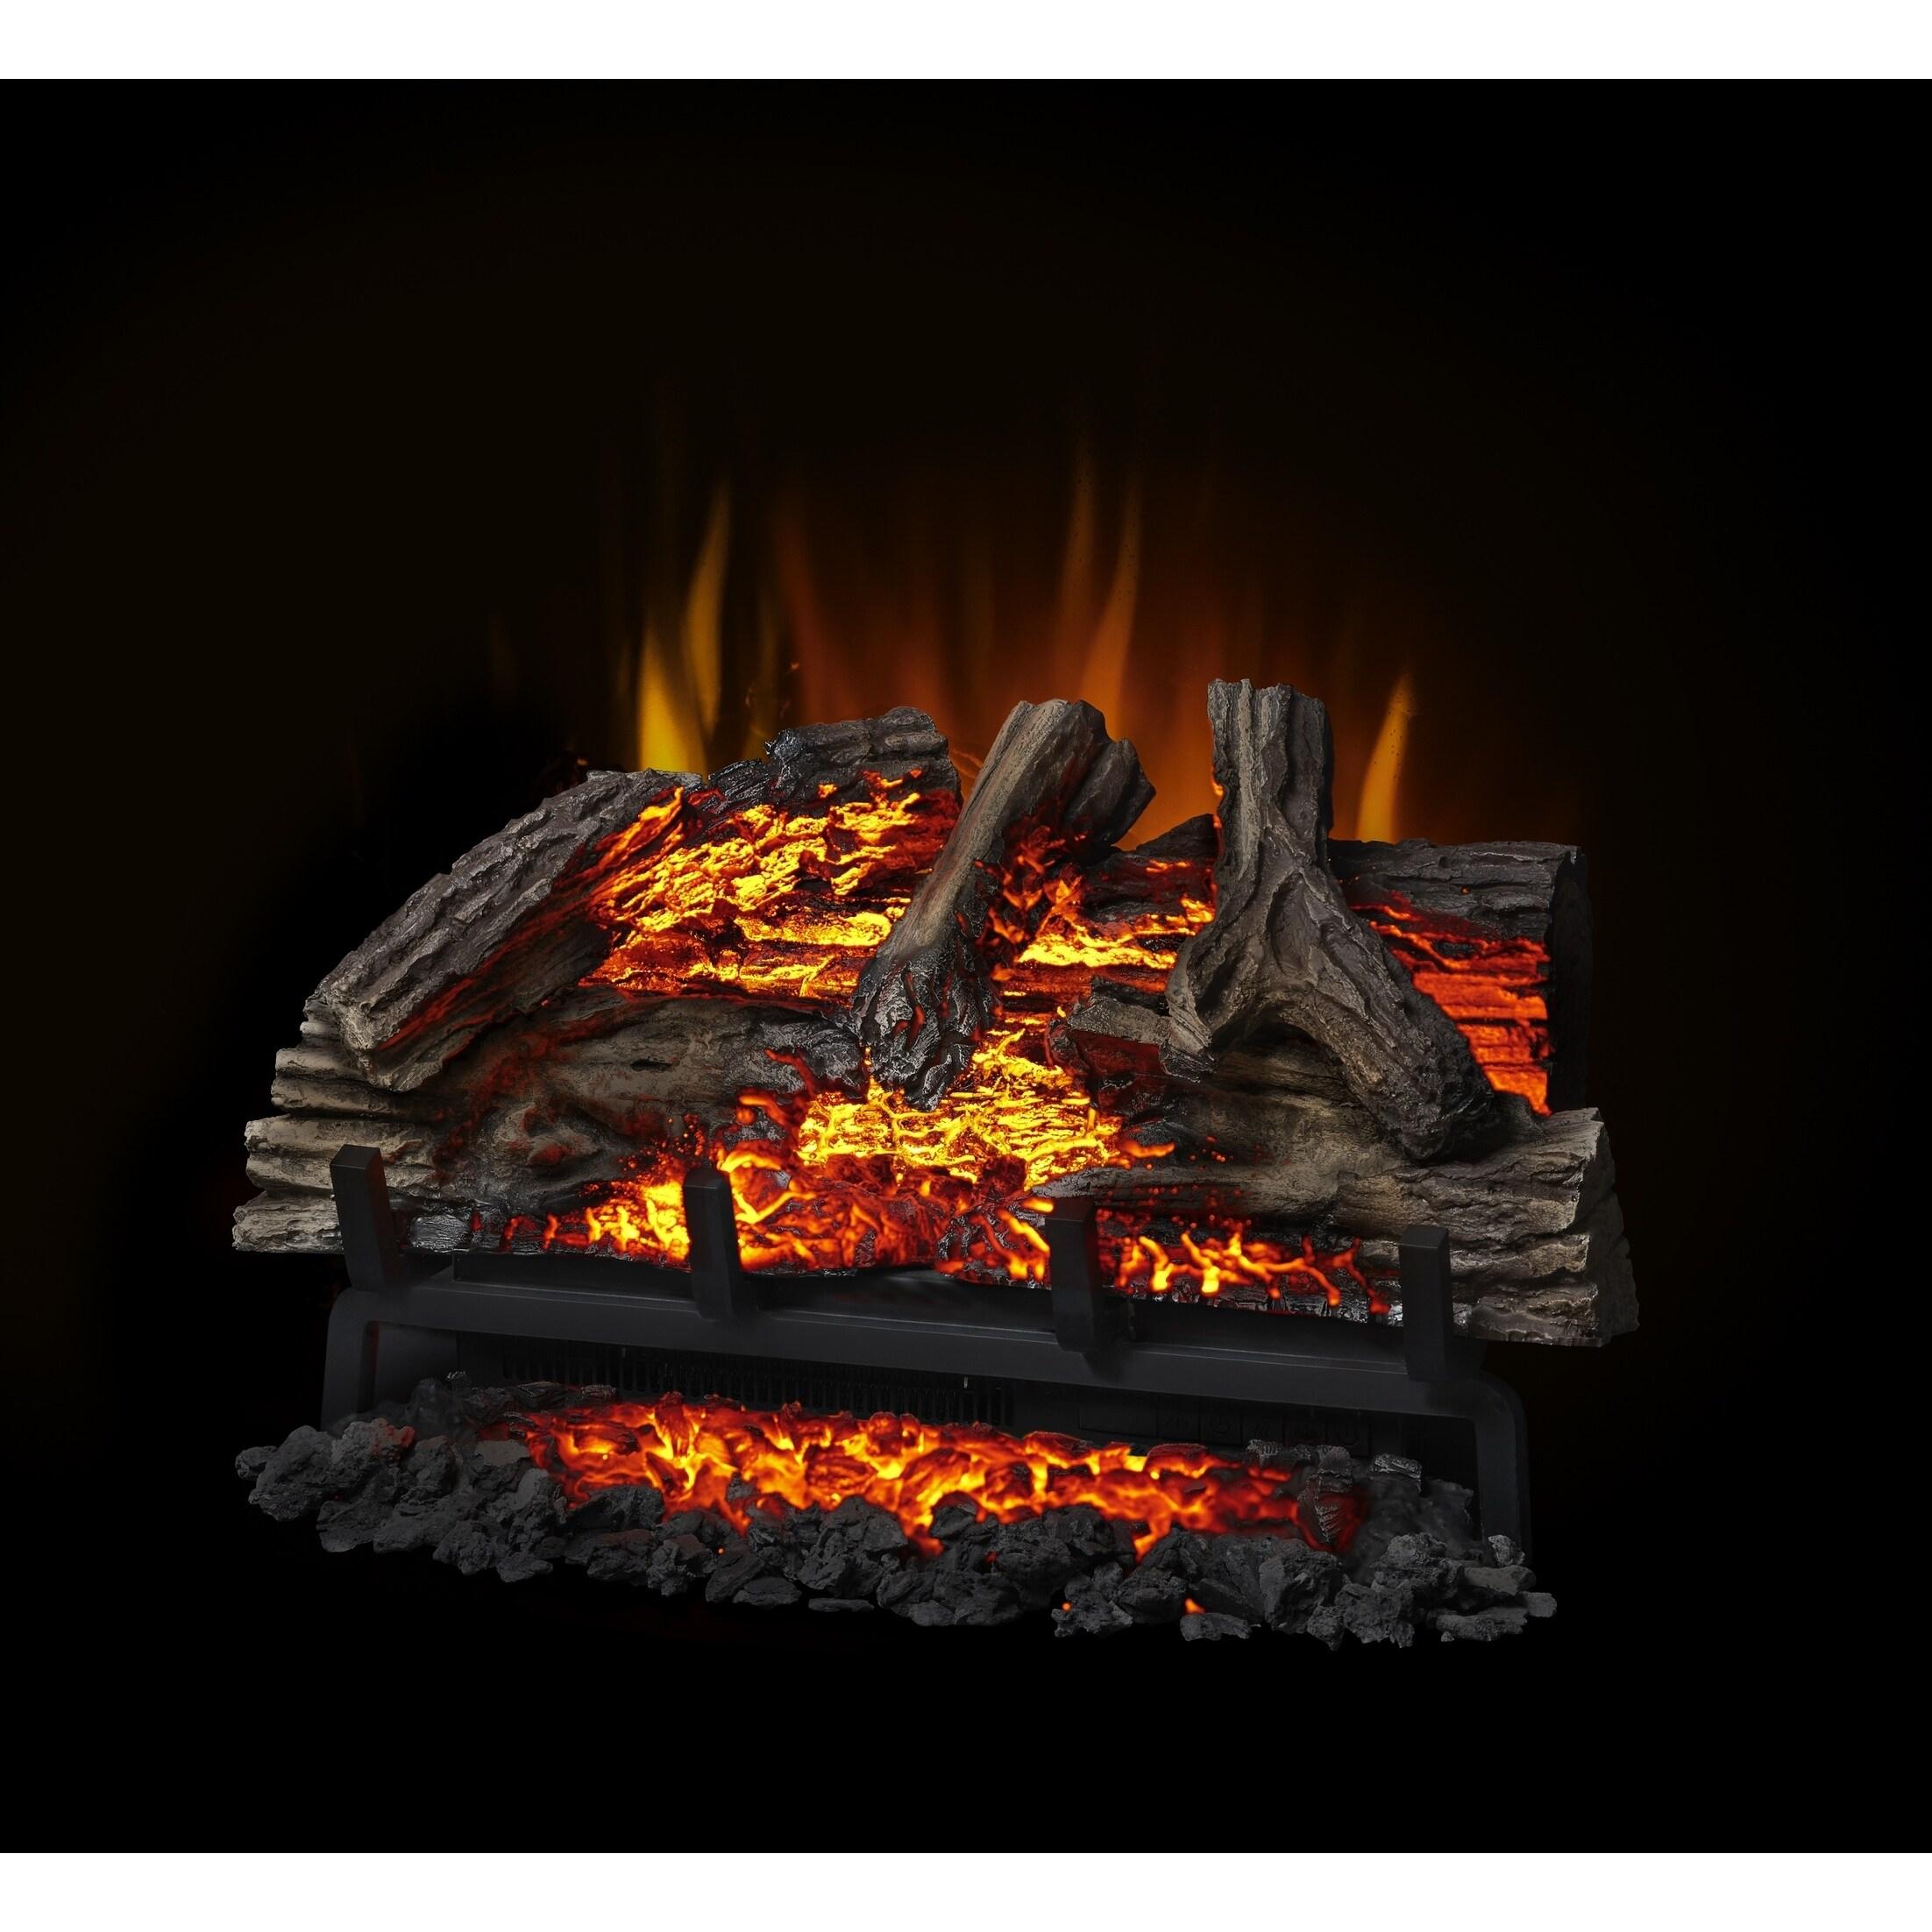 Enjoyable Napoleon Woodland 27 Inch Electric Log Set Fireplace Insert With Remote Control Interior Design Ideas Gentotryabchikinfo